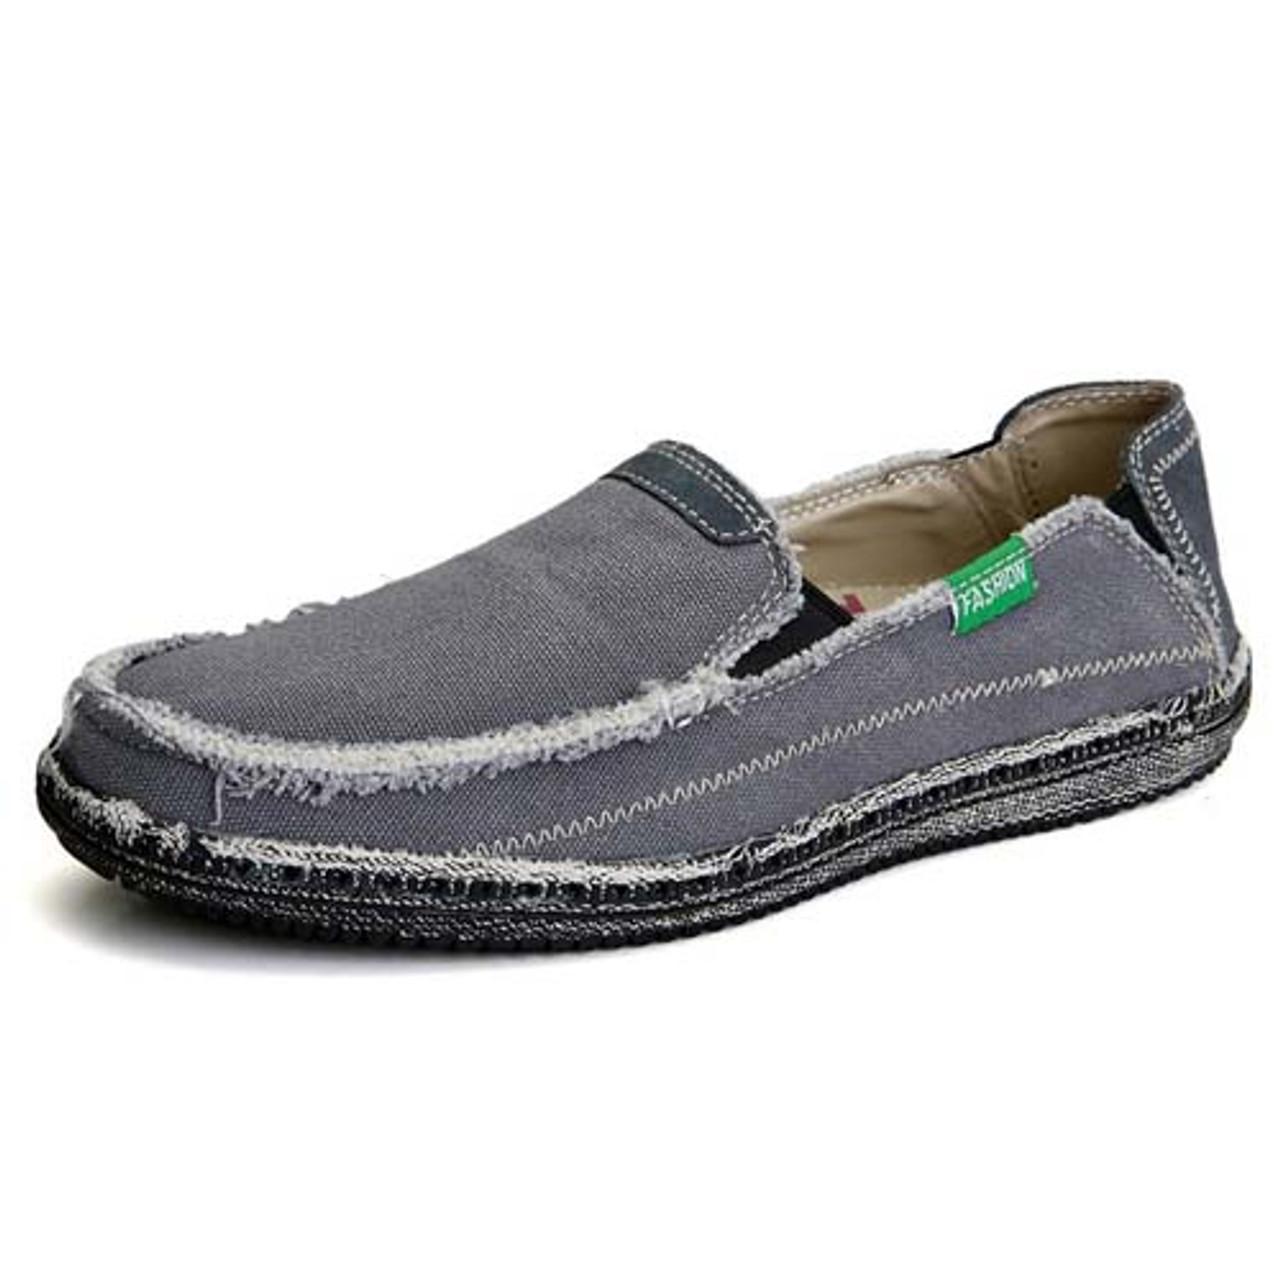 Grey casual denim style Converse slip